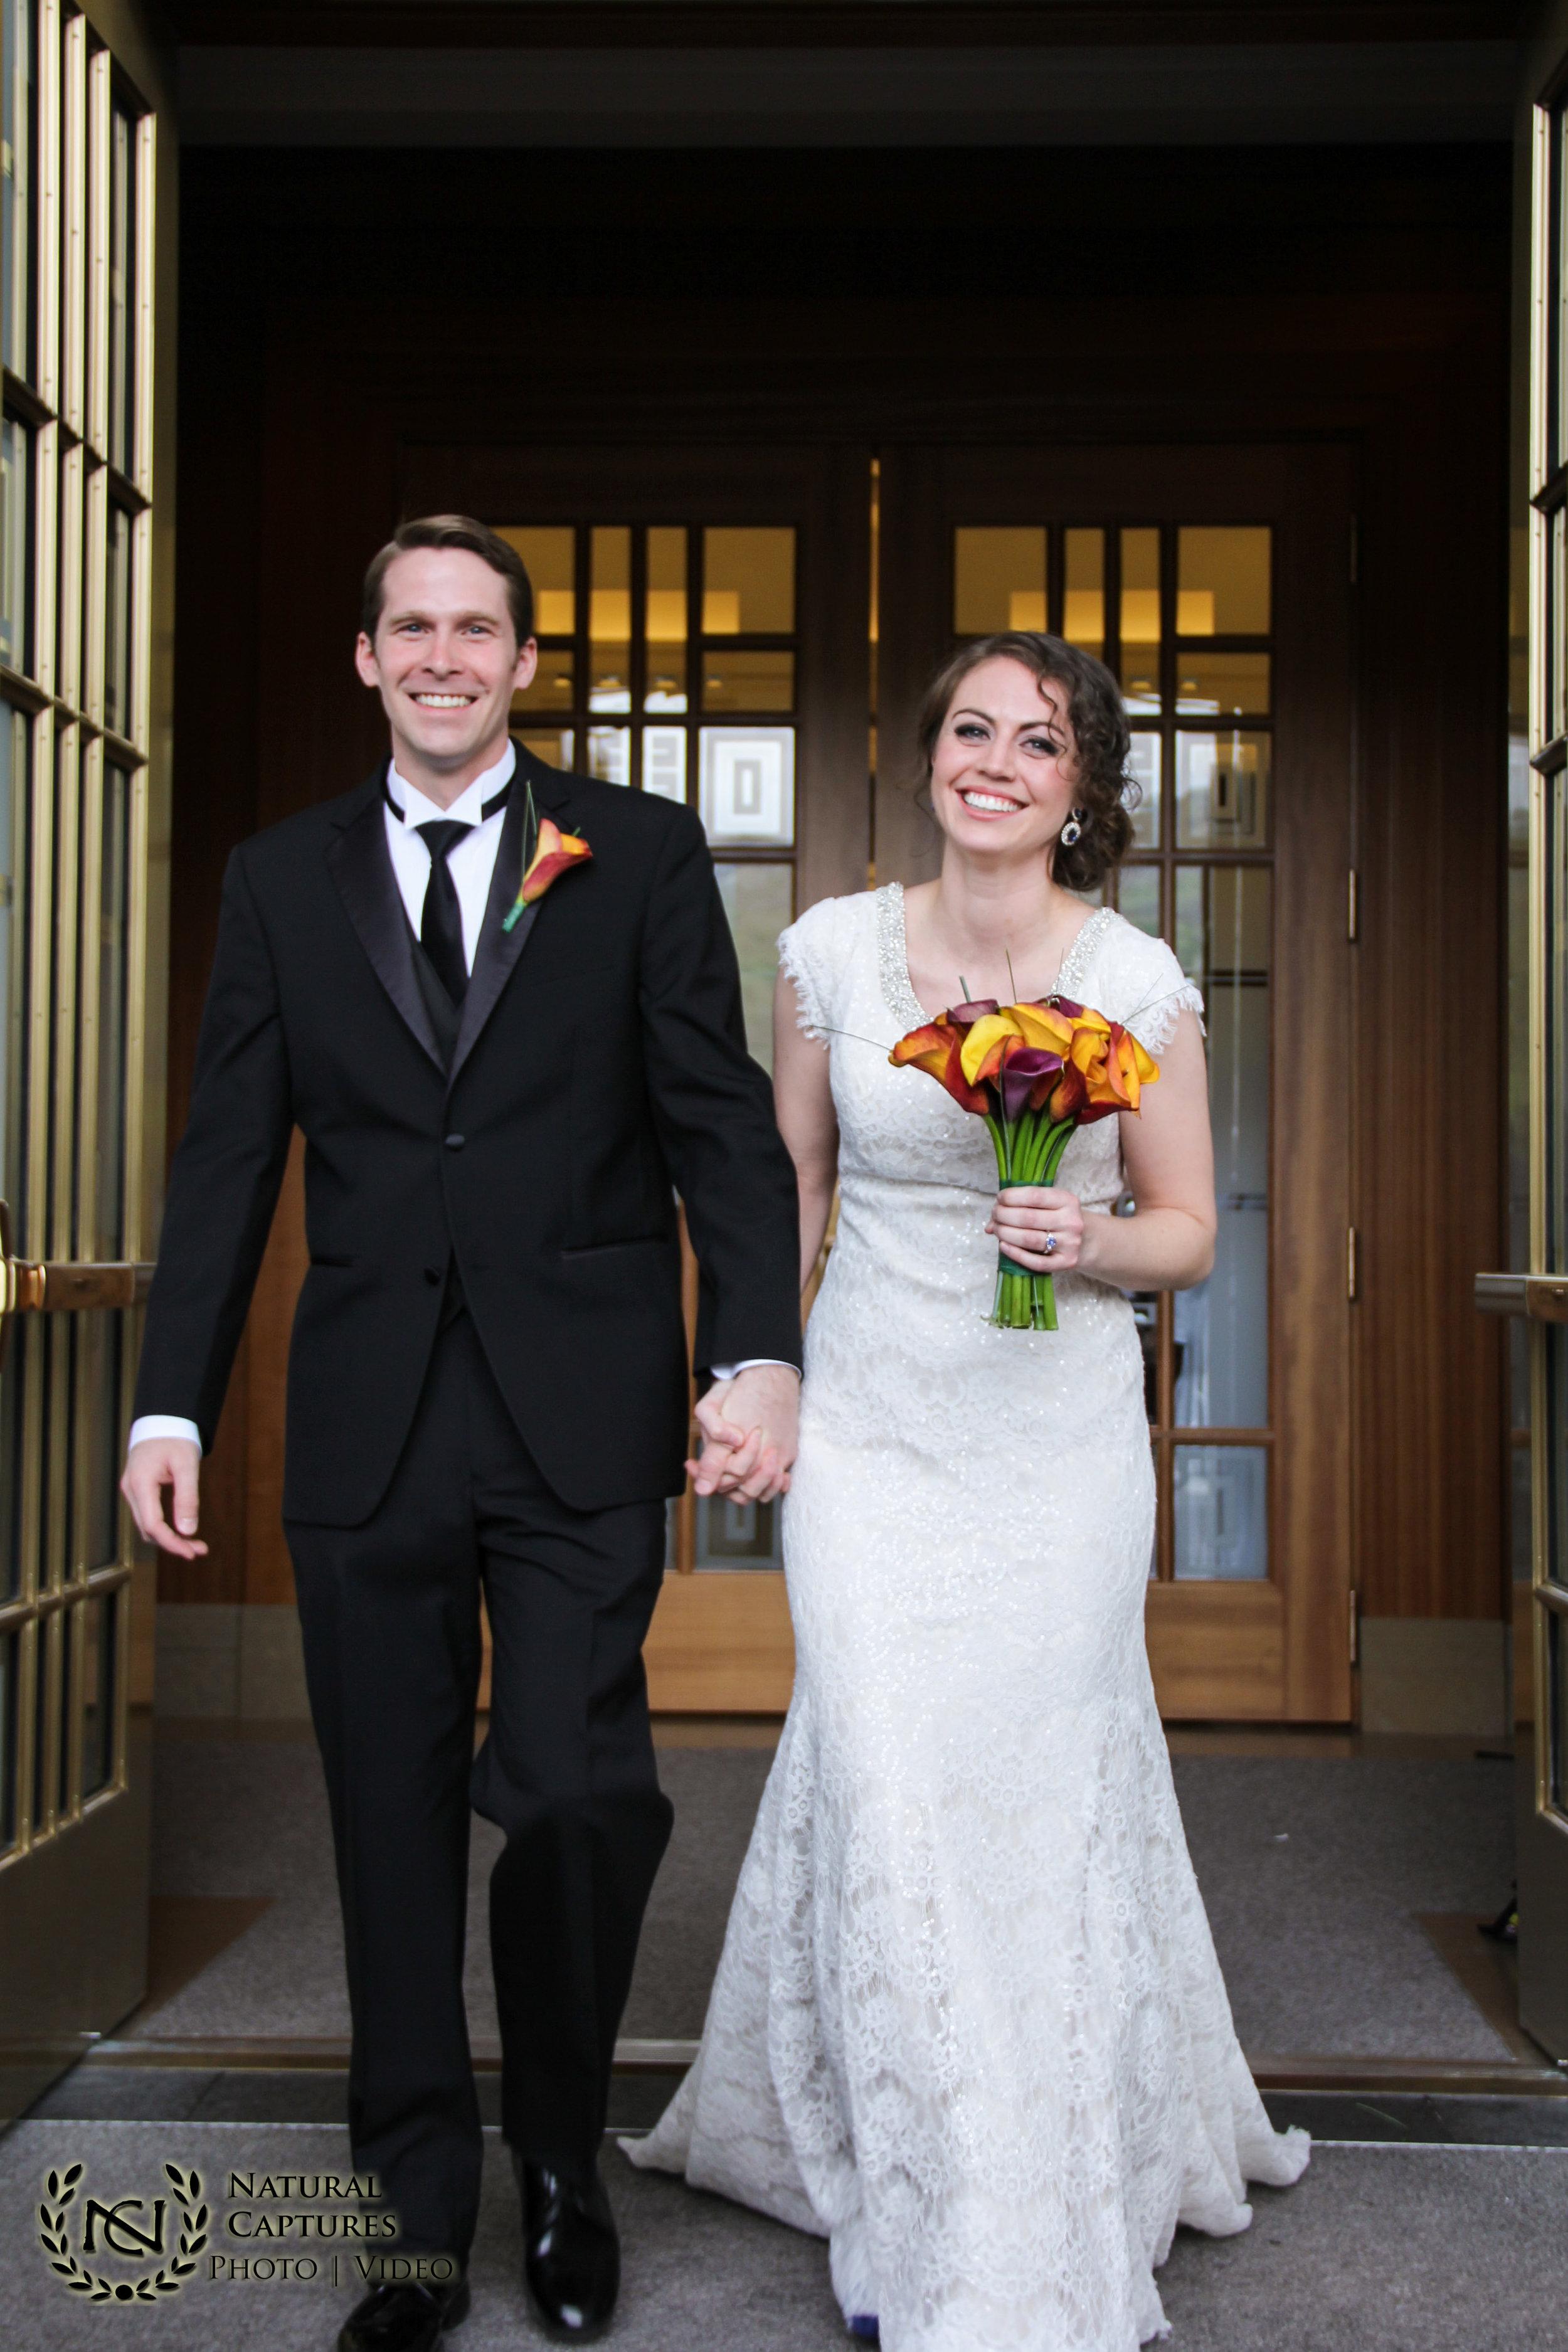 Draper Utah Temple Wedding Photography (2 of 12)